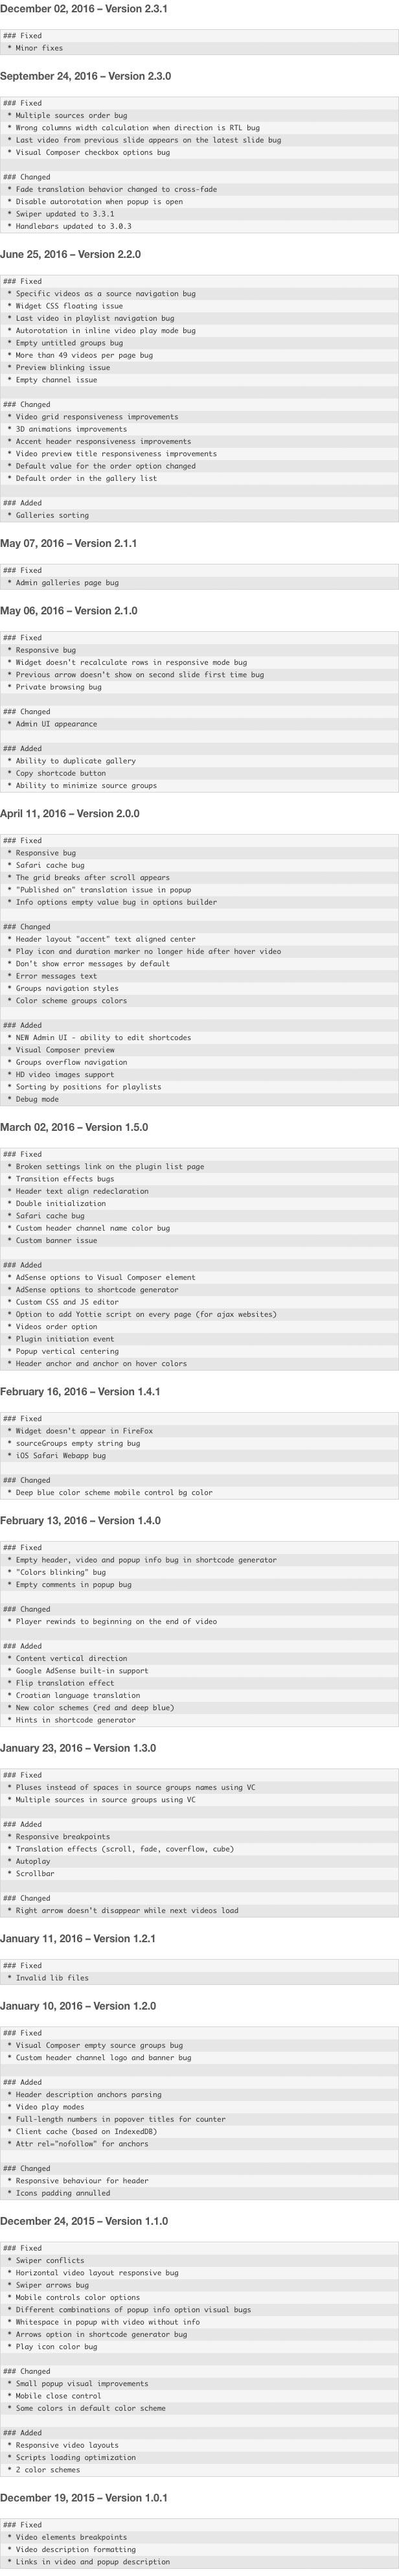 Yottie WordPress Plugin changelog